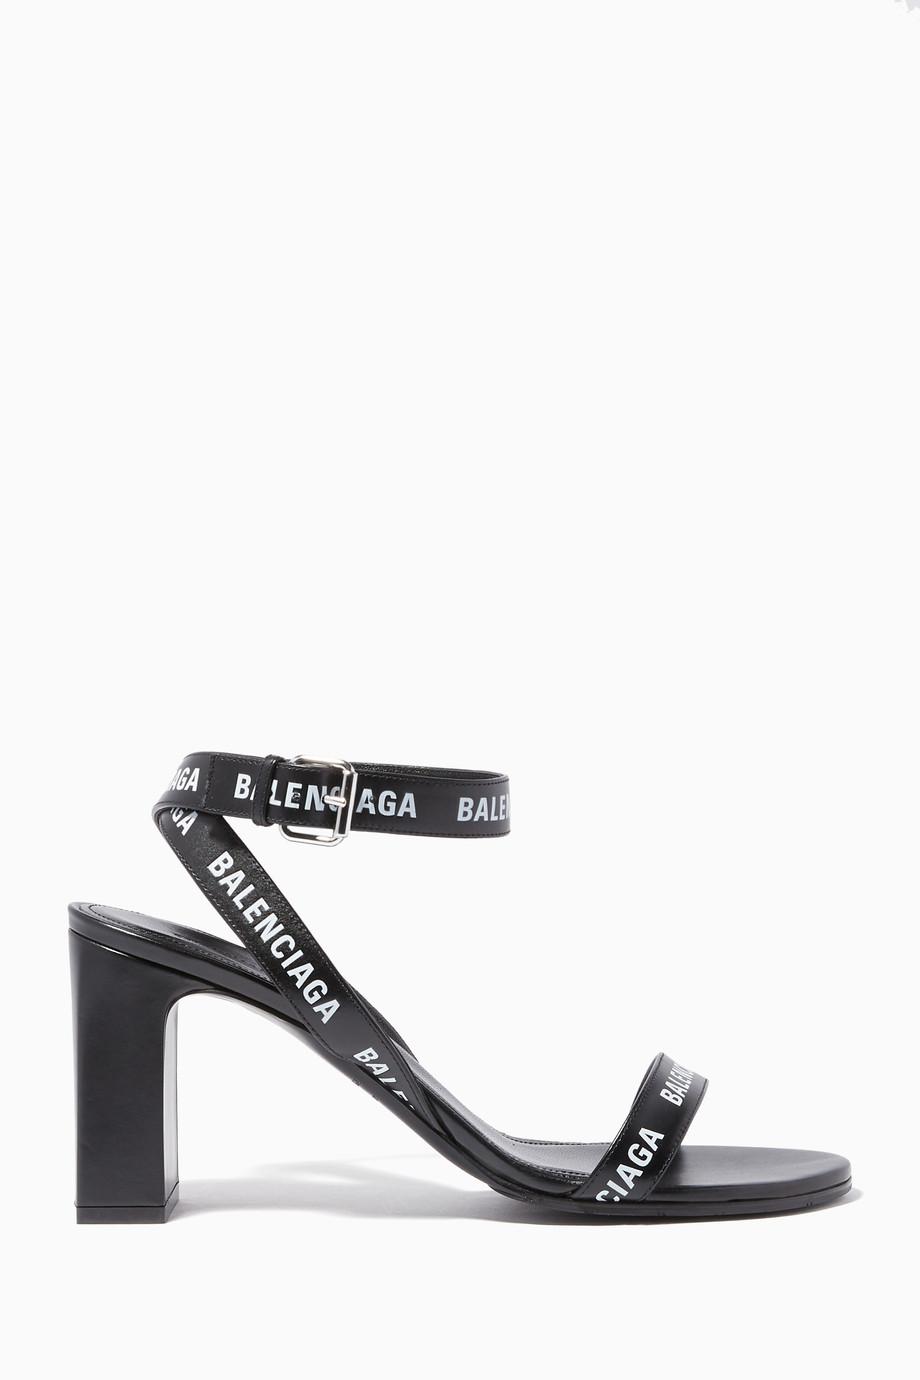 9f4c815328d Shop Balenciaga Black Logo-Strap Chunky Heel Sandals for Women ...